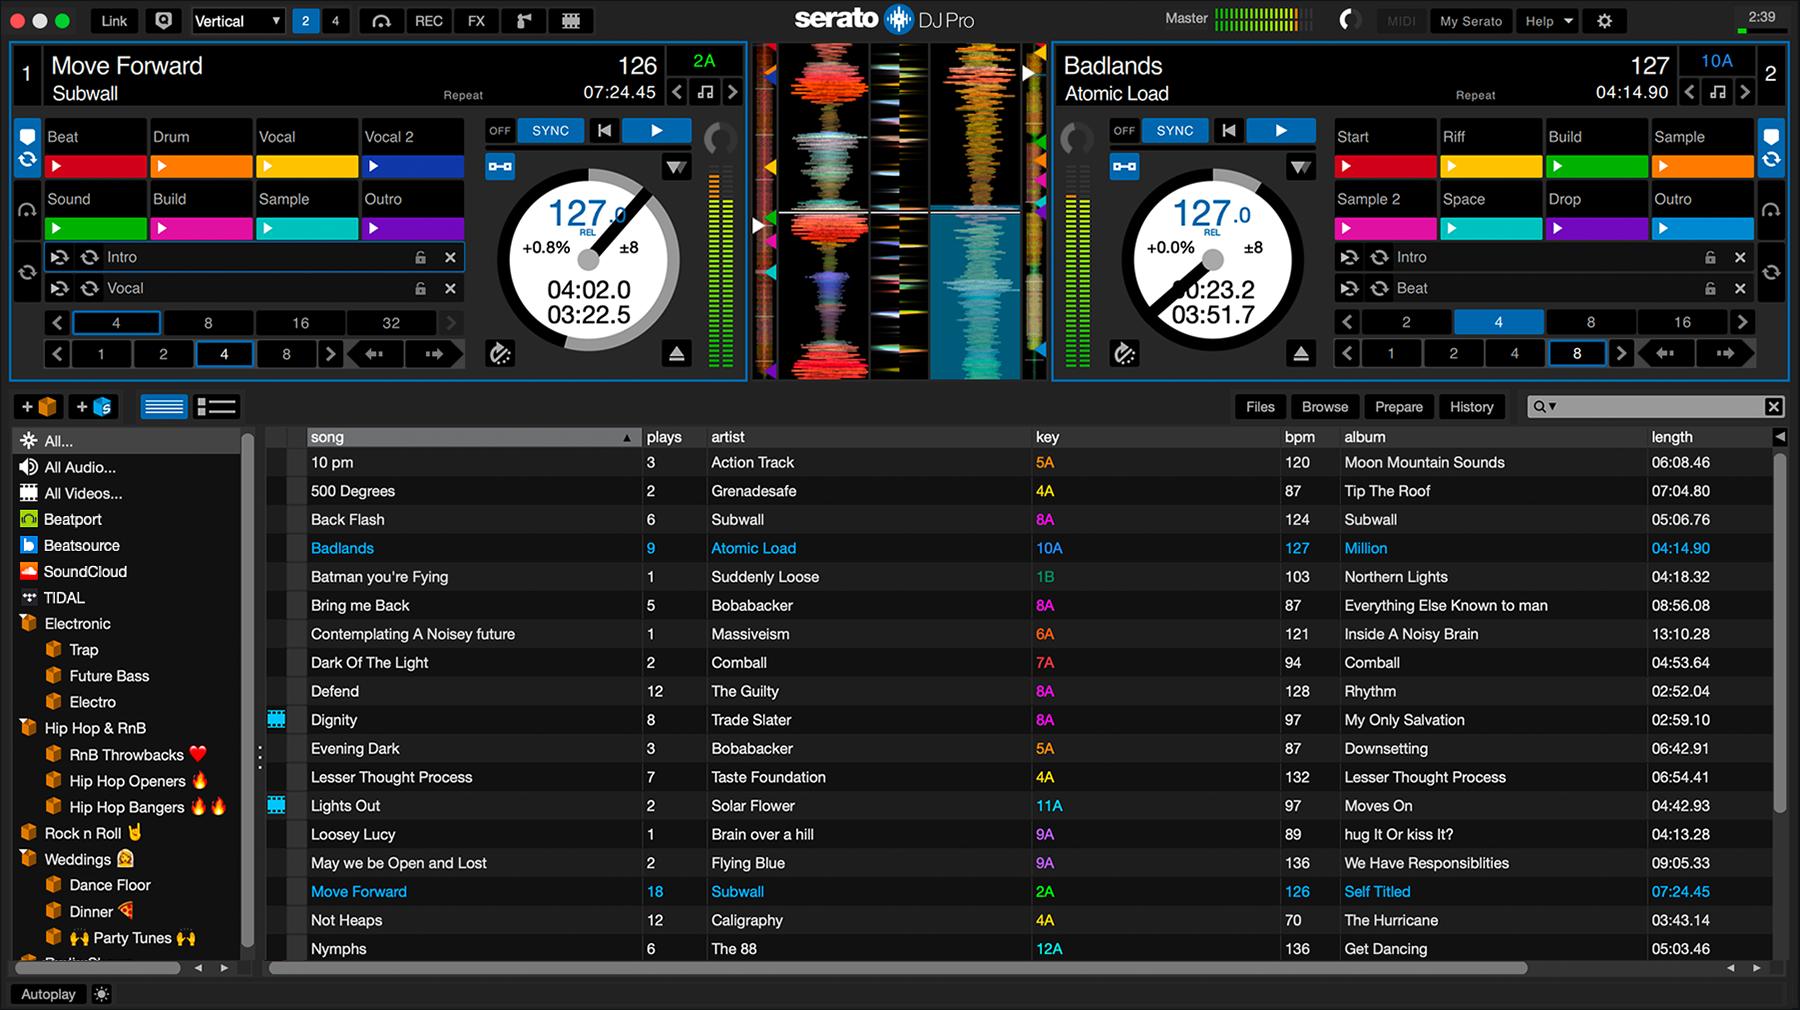 Serato DJ Pro 2.4.4